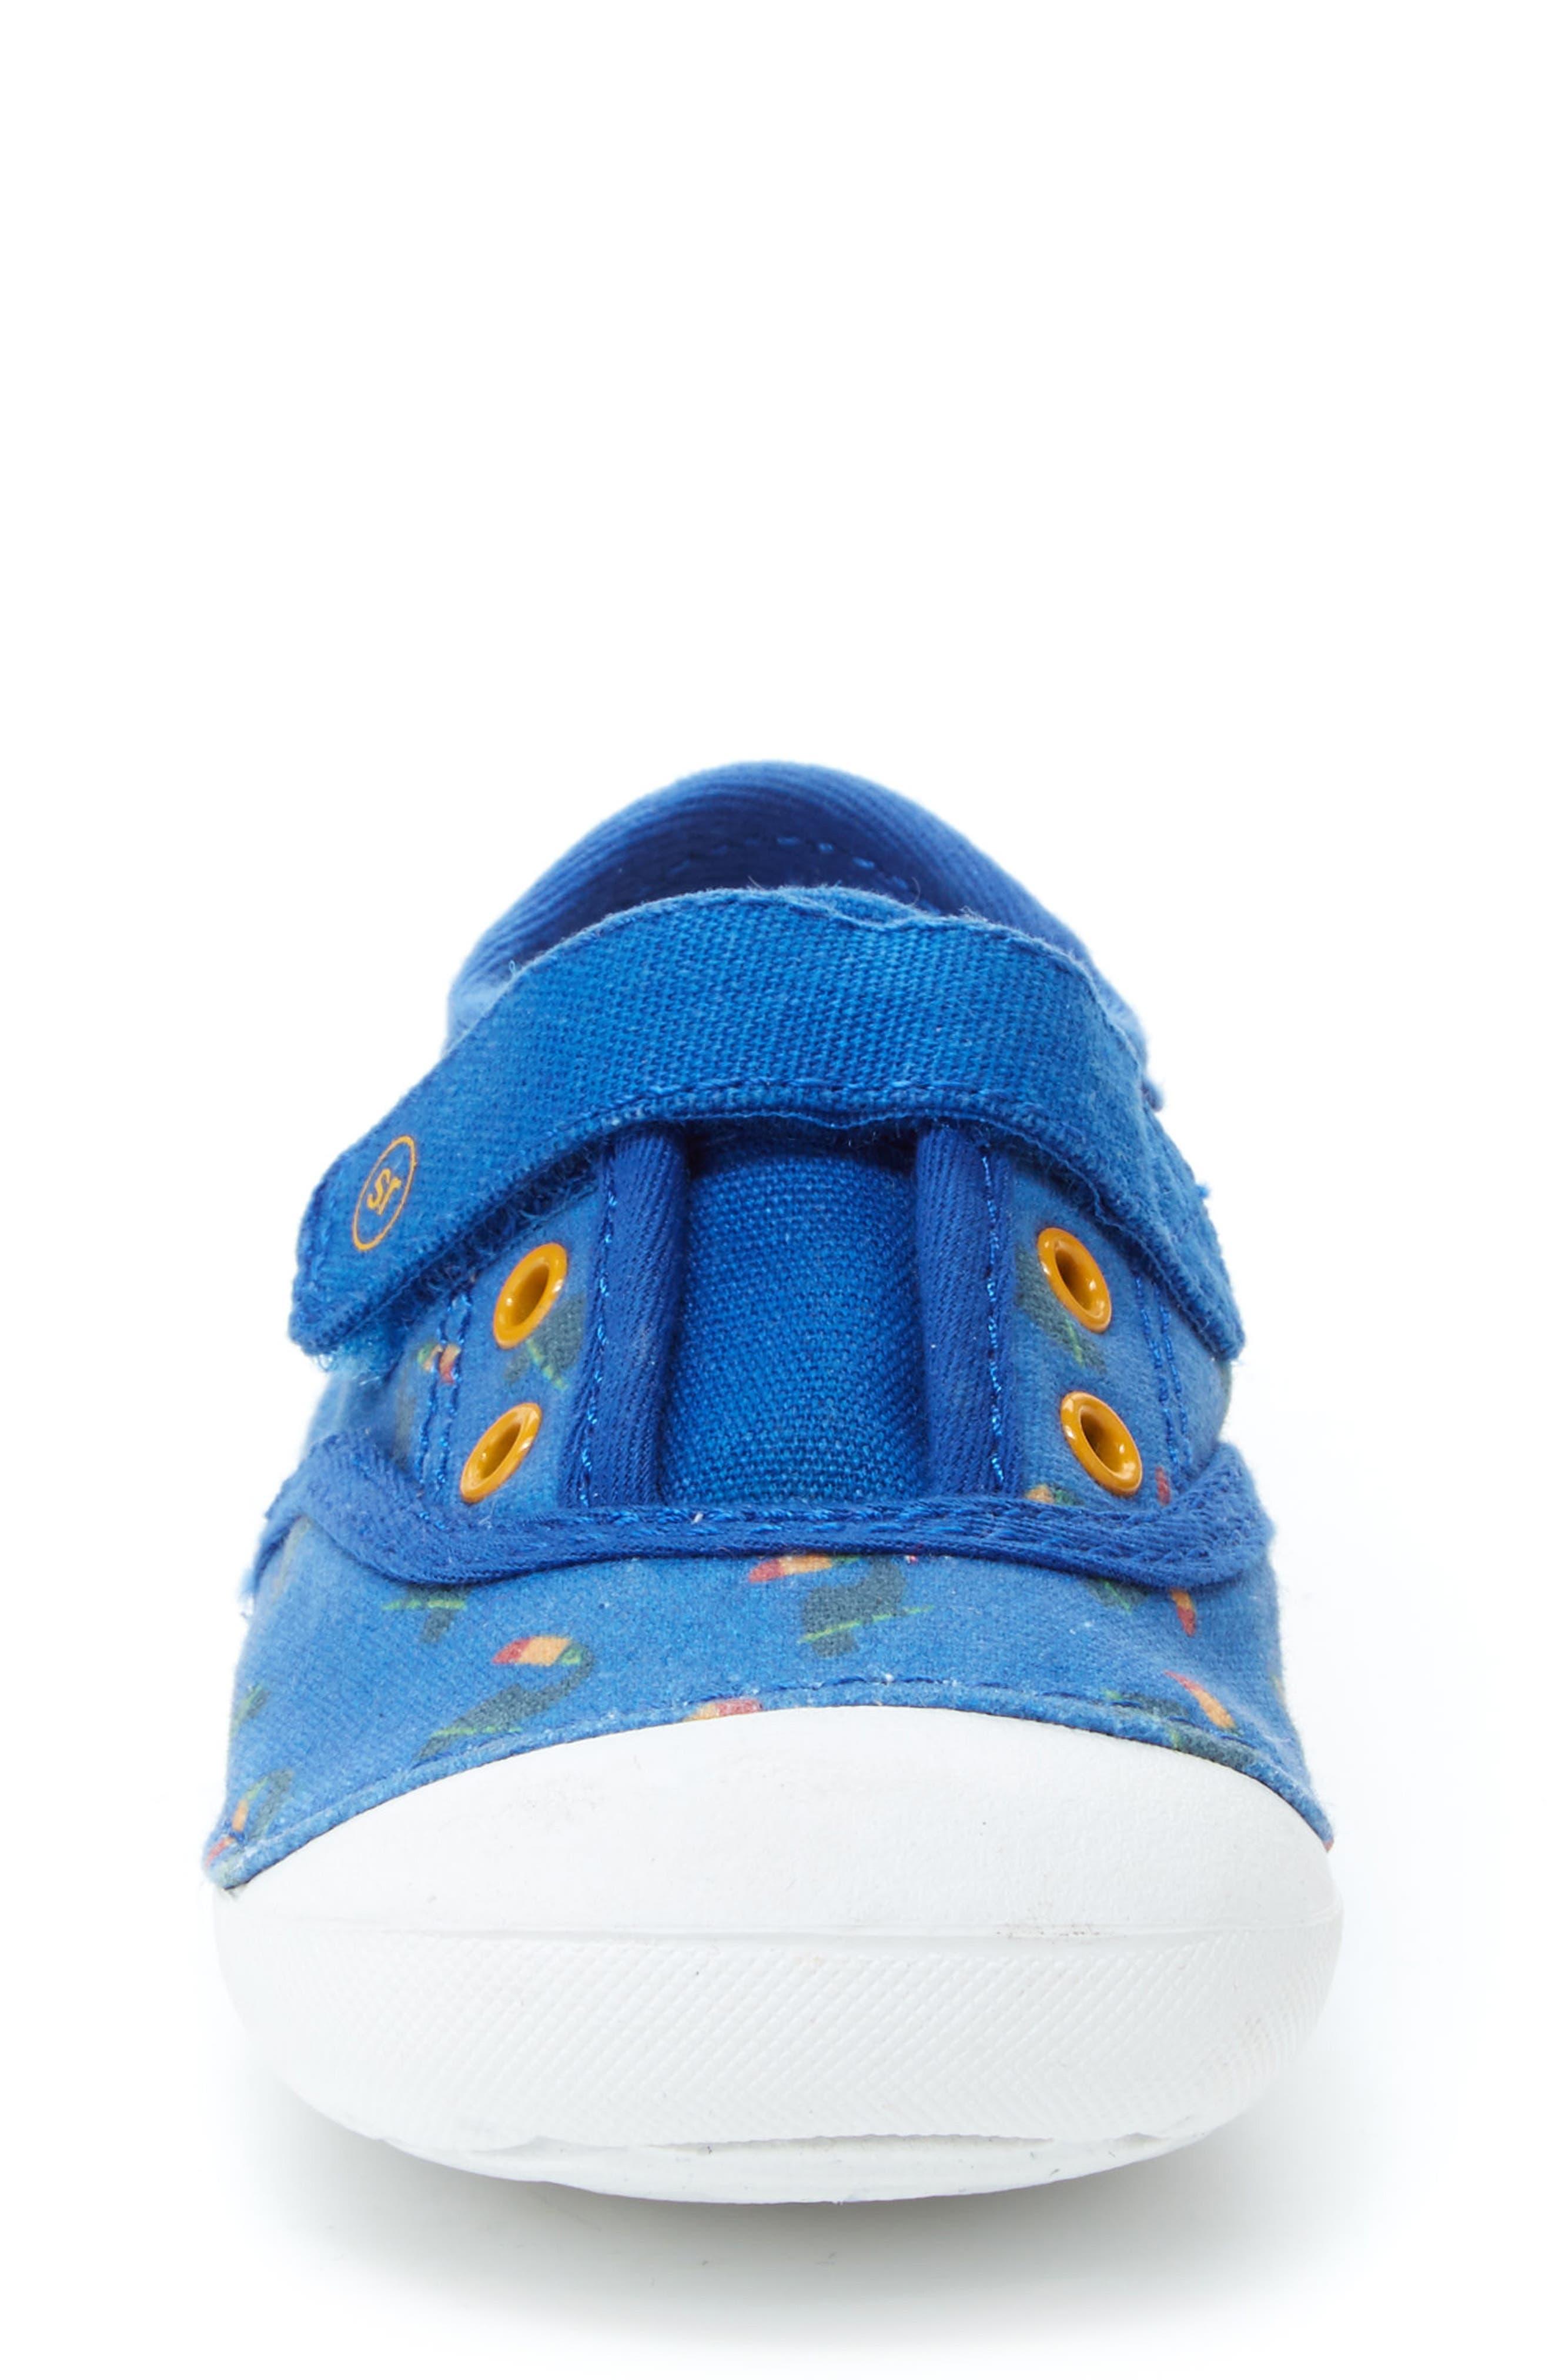 Soft Motion Avery Sneaker,                             Alternate thumbnail 3, color,                             Blue Toucan